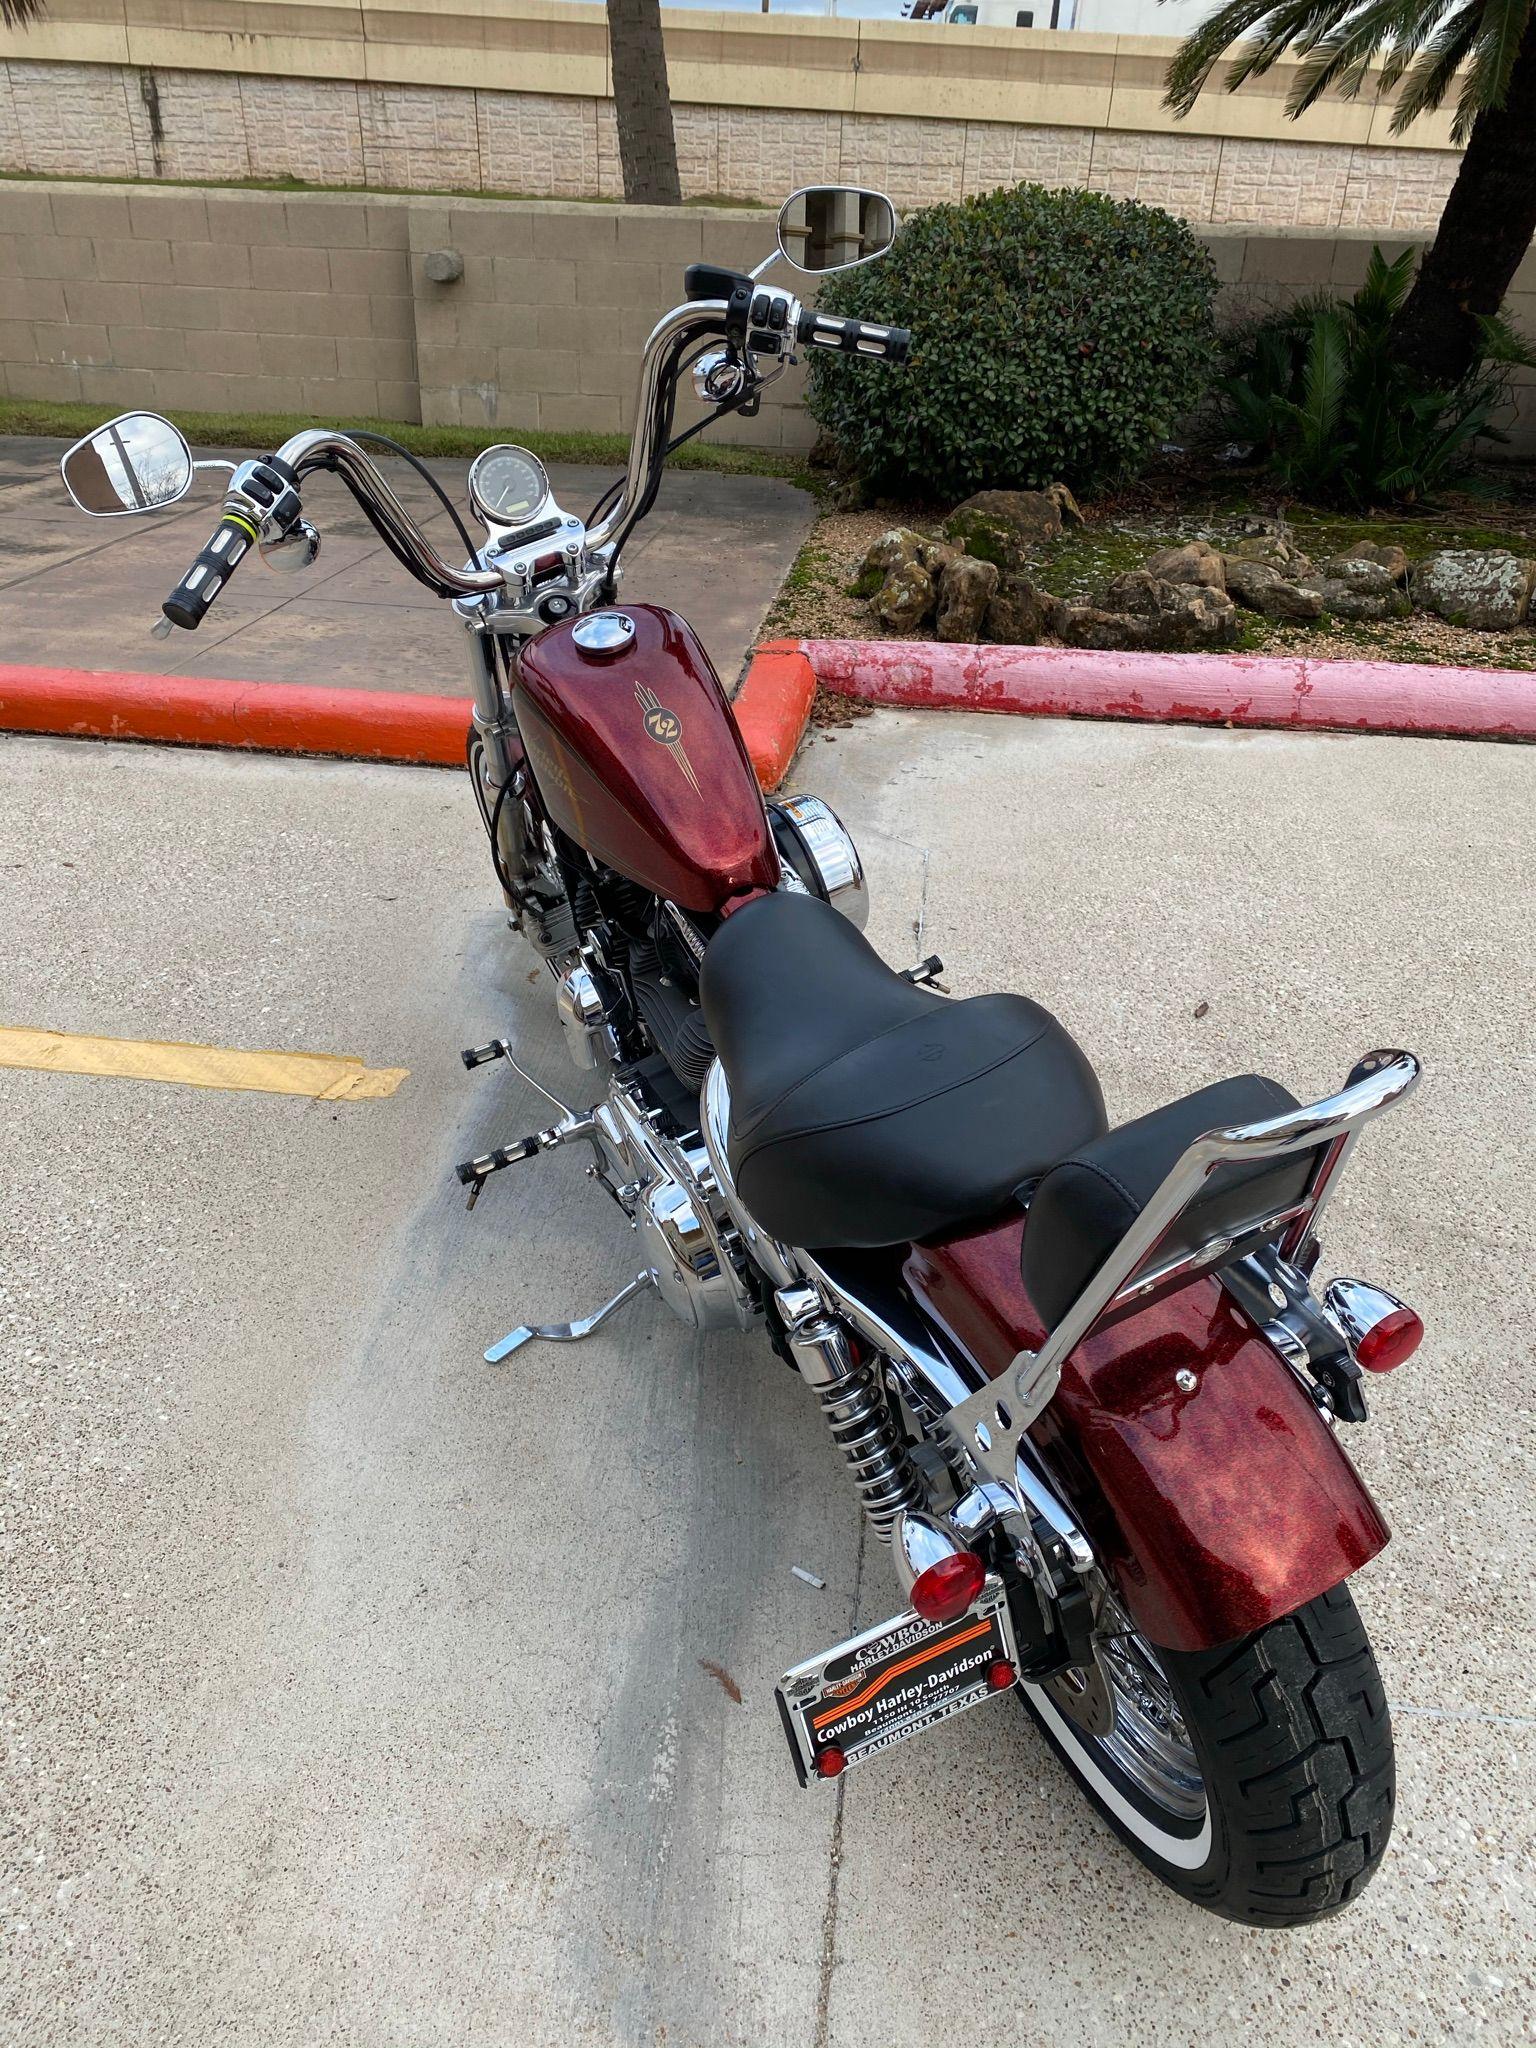 Pre Owned 2012 Harley Davidson XL1200V   Sportster Seventy Two